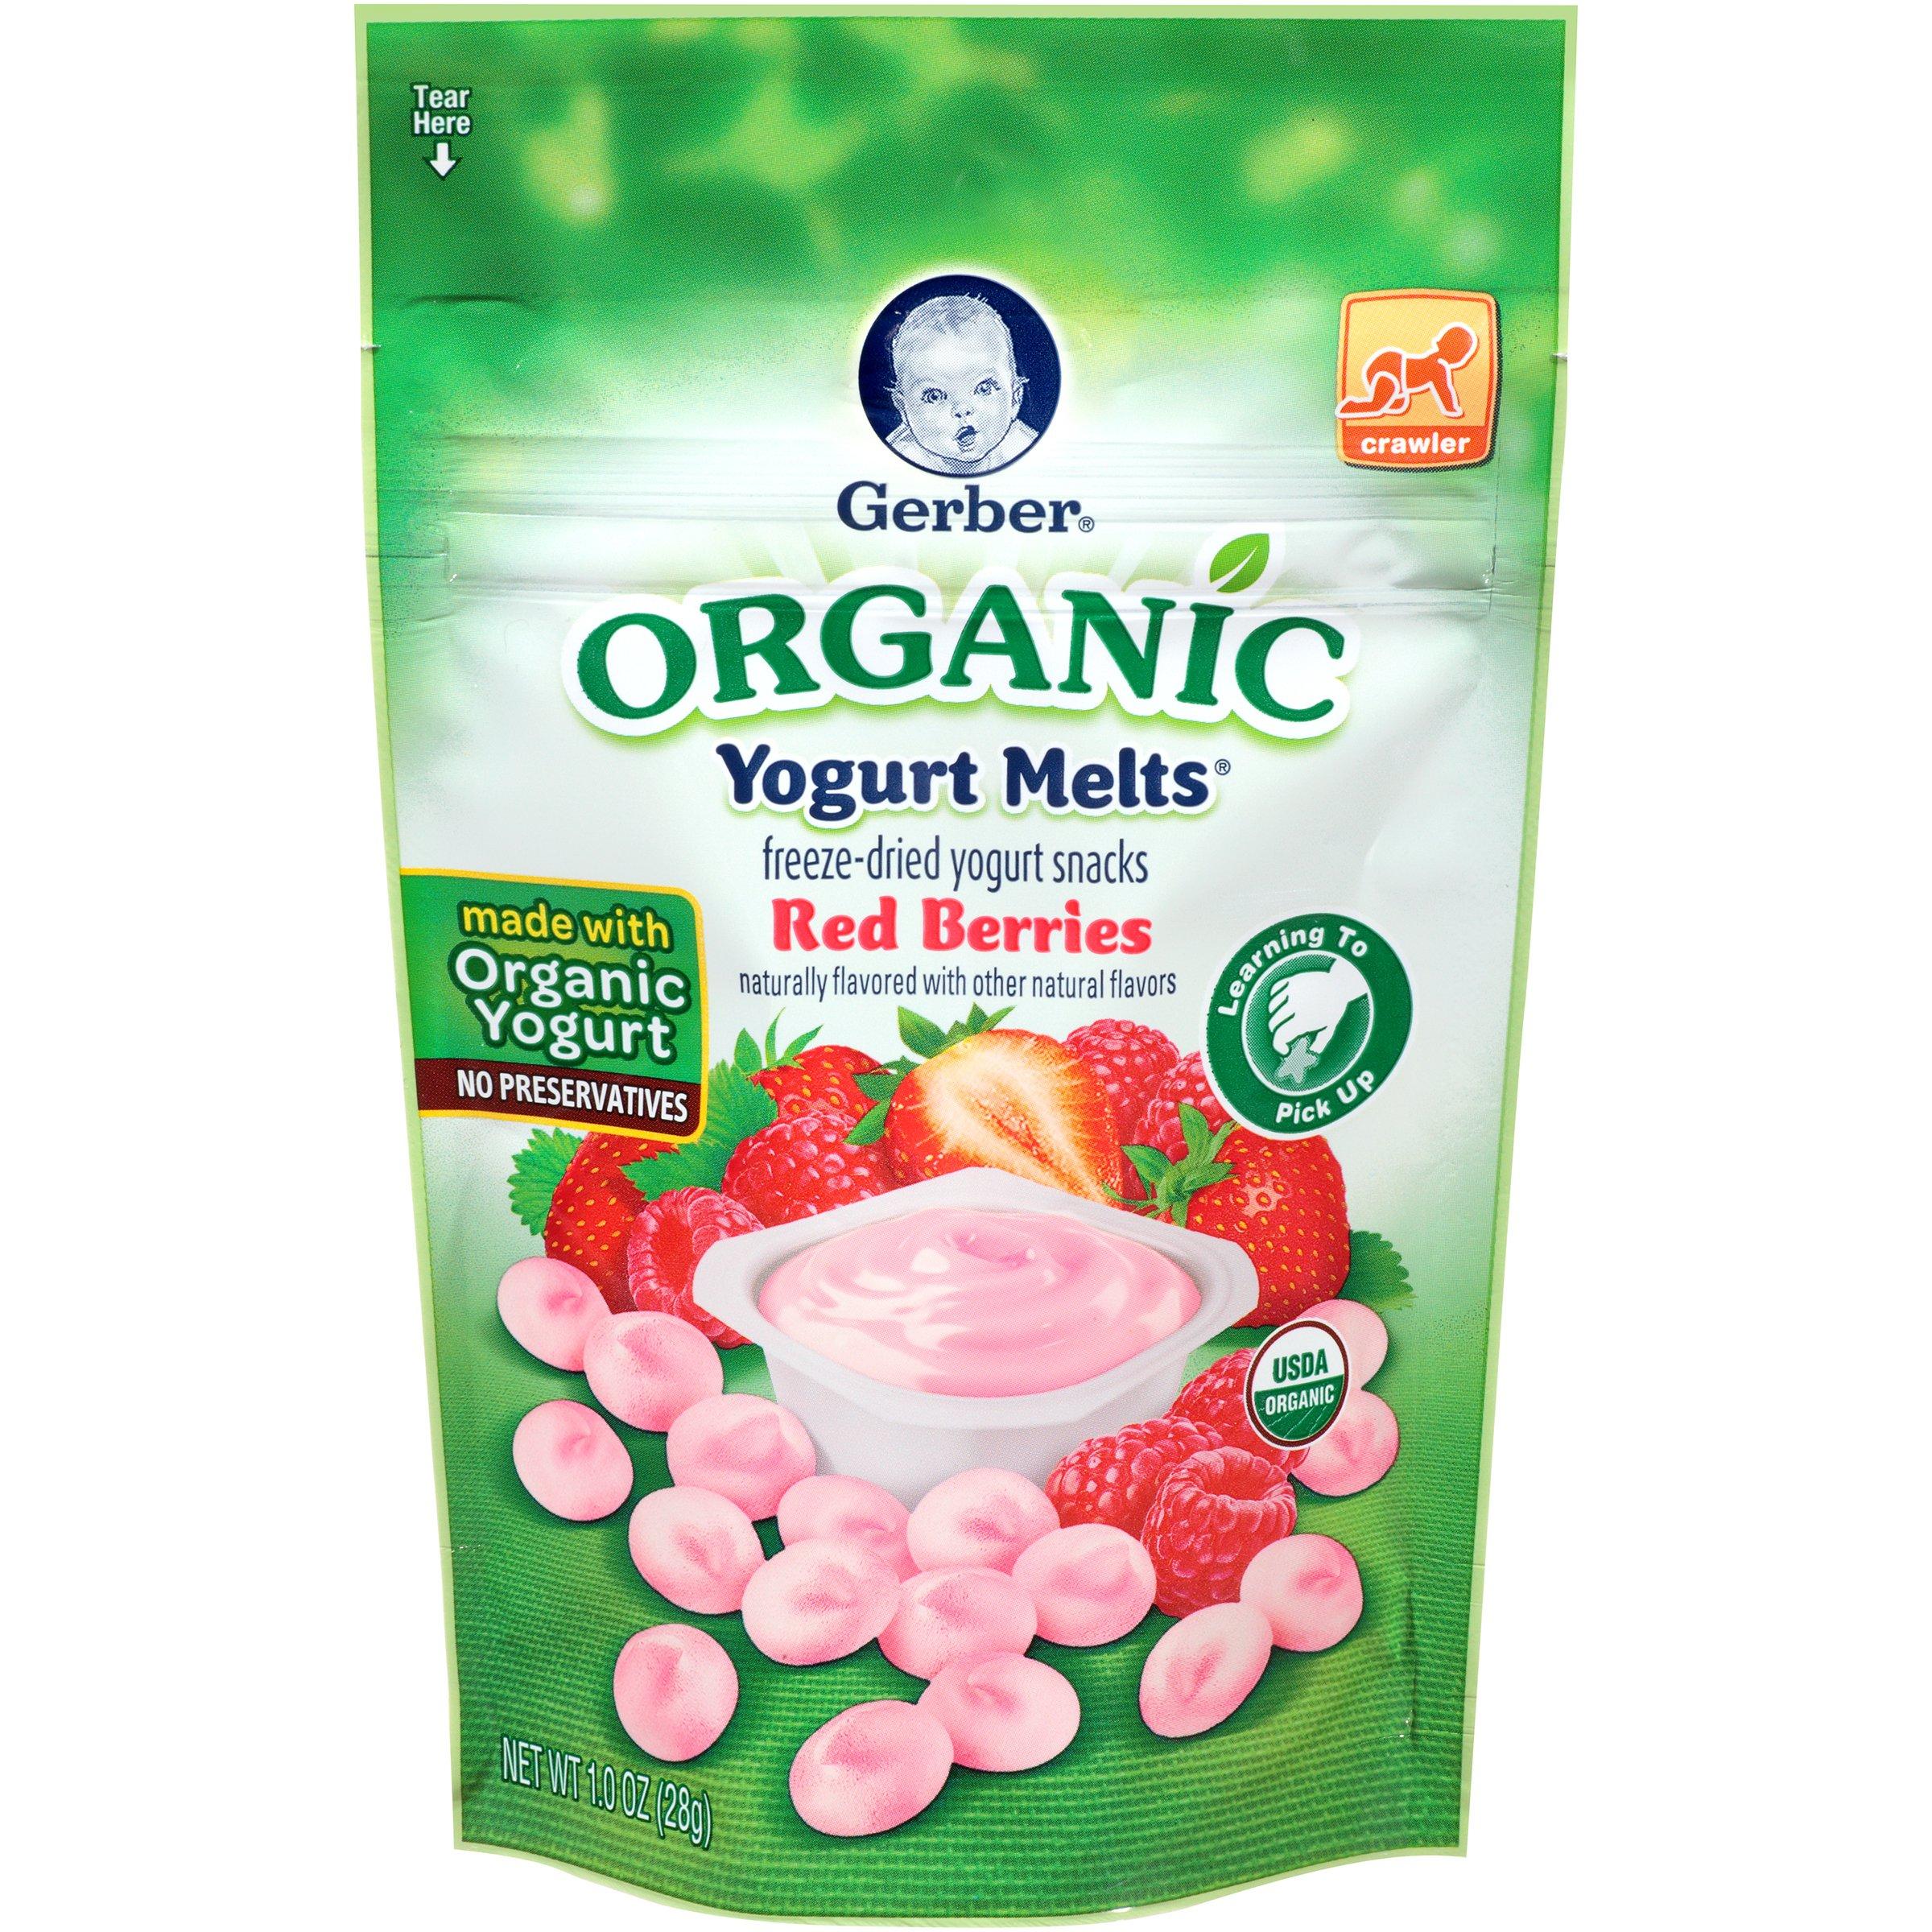 Gerber Organic Yogurt Melts, Red Berries, 1 oz